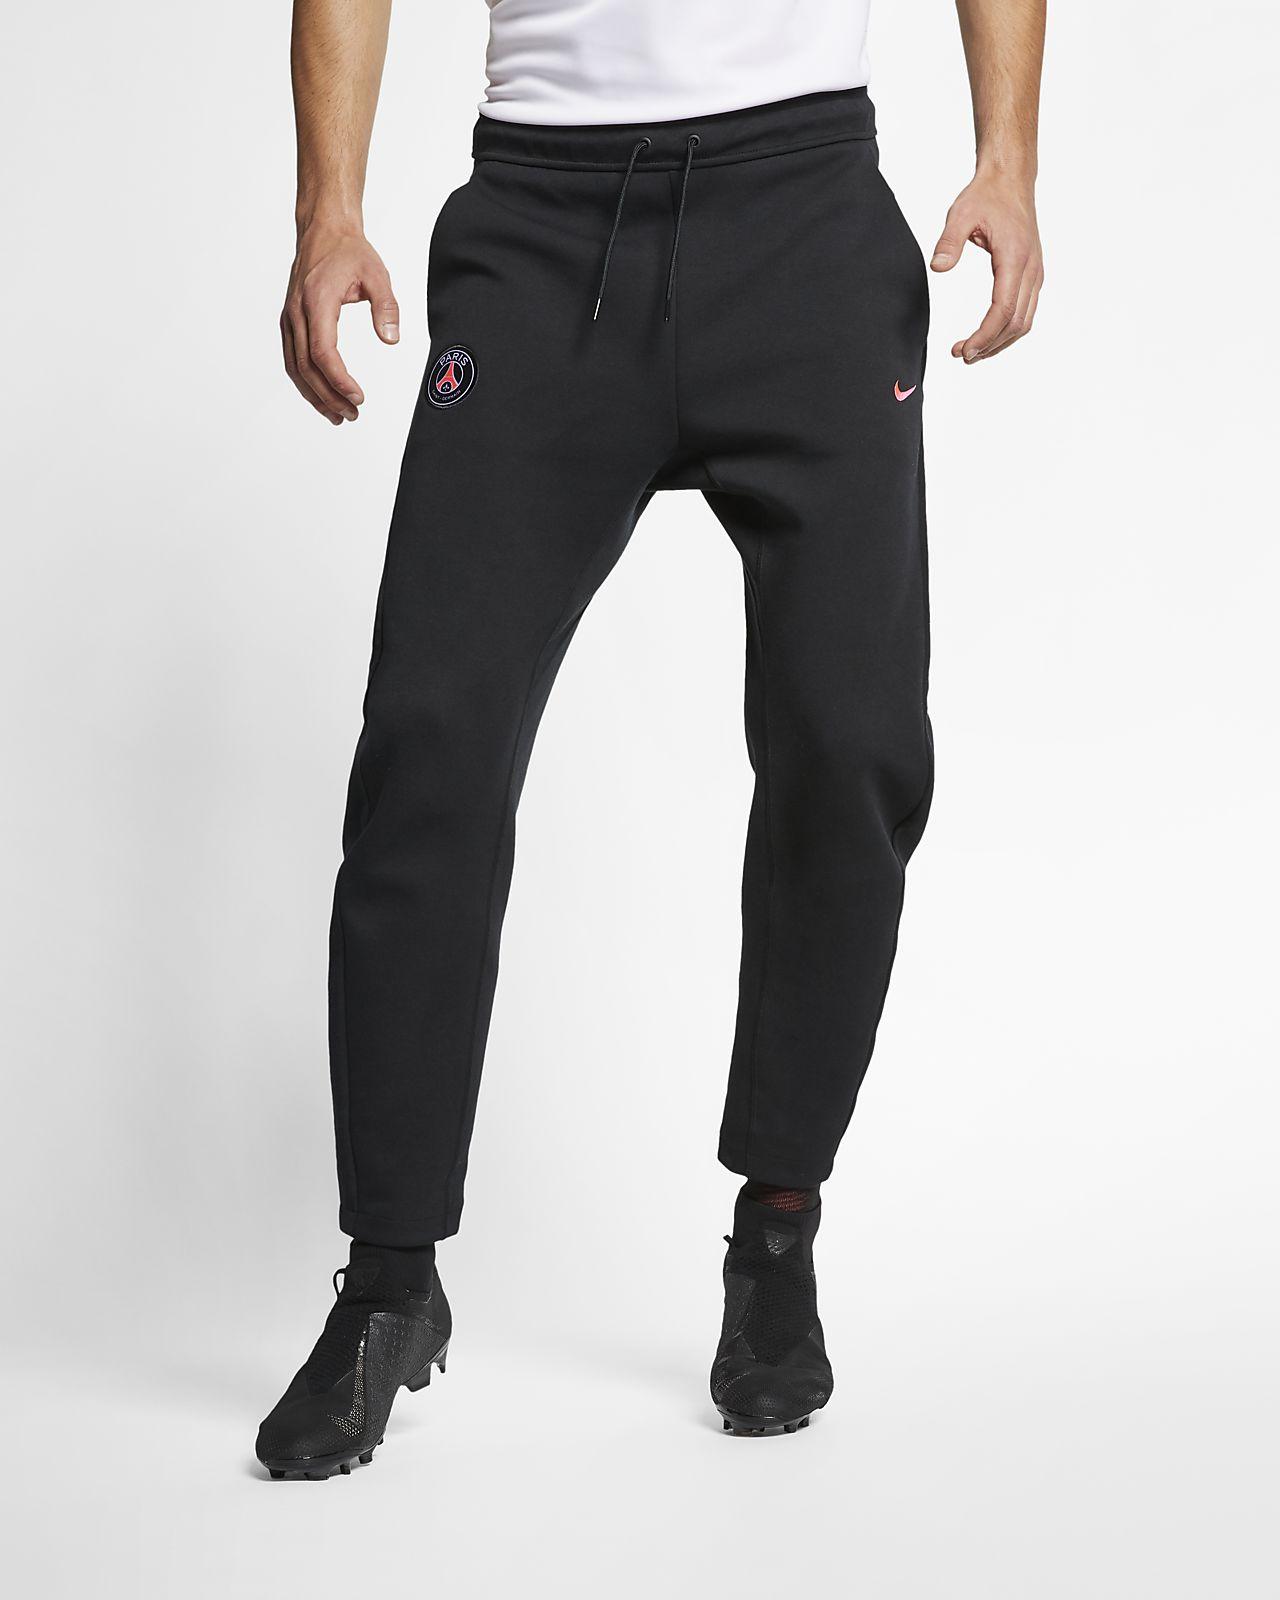 Pantaloni Paris Saint-Germain Tech Fleece - Uomo